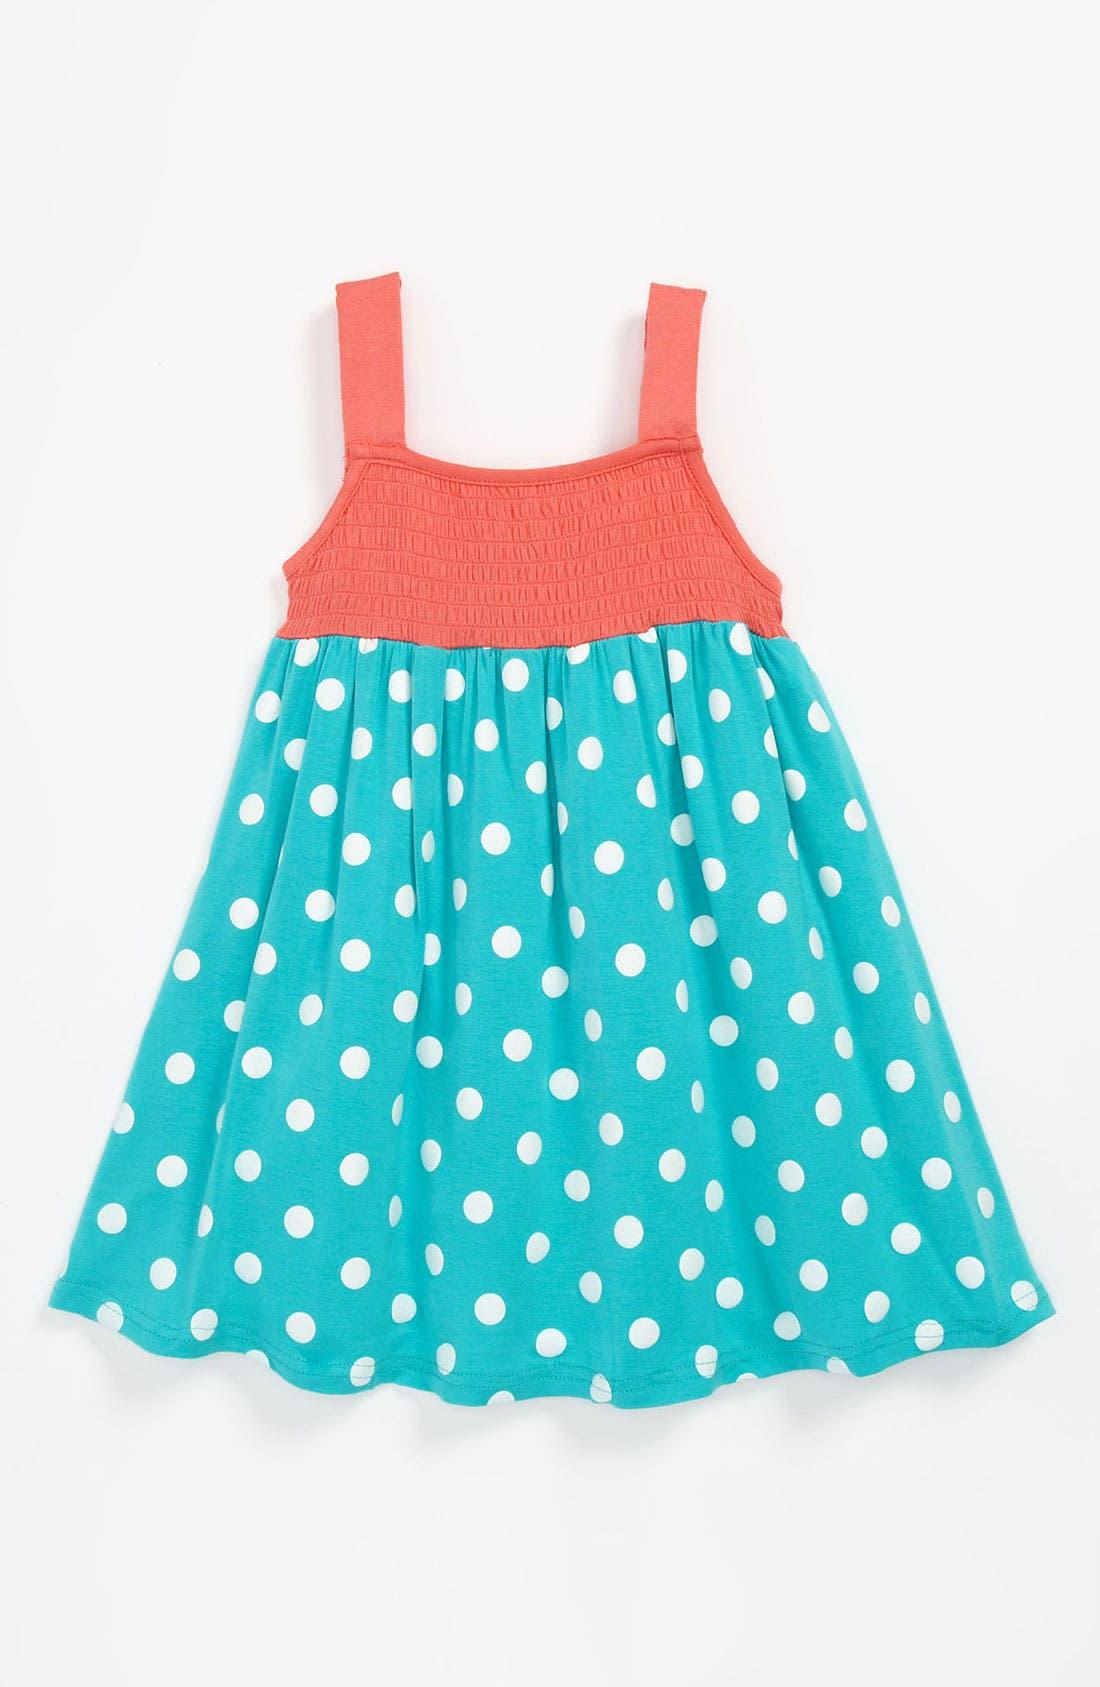 Alternate Image 1 Selected - Pumpkin Patch Polka Dot Dress (Baby)